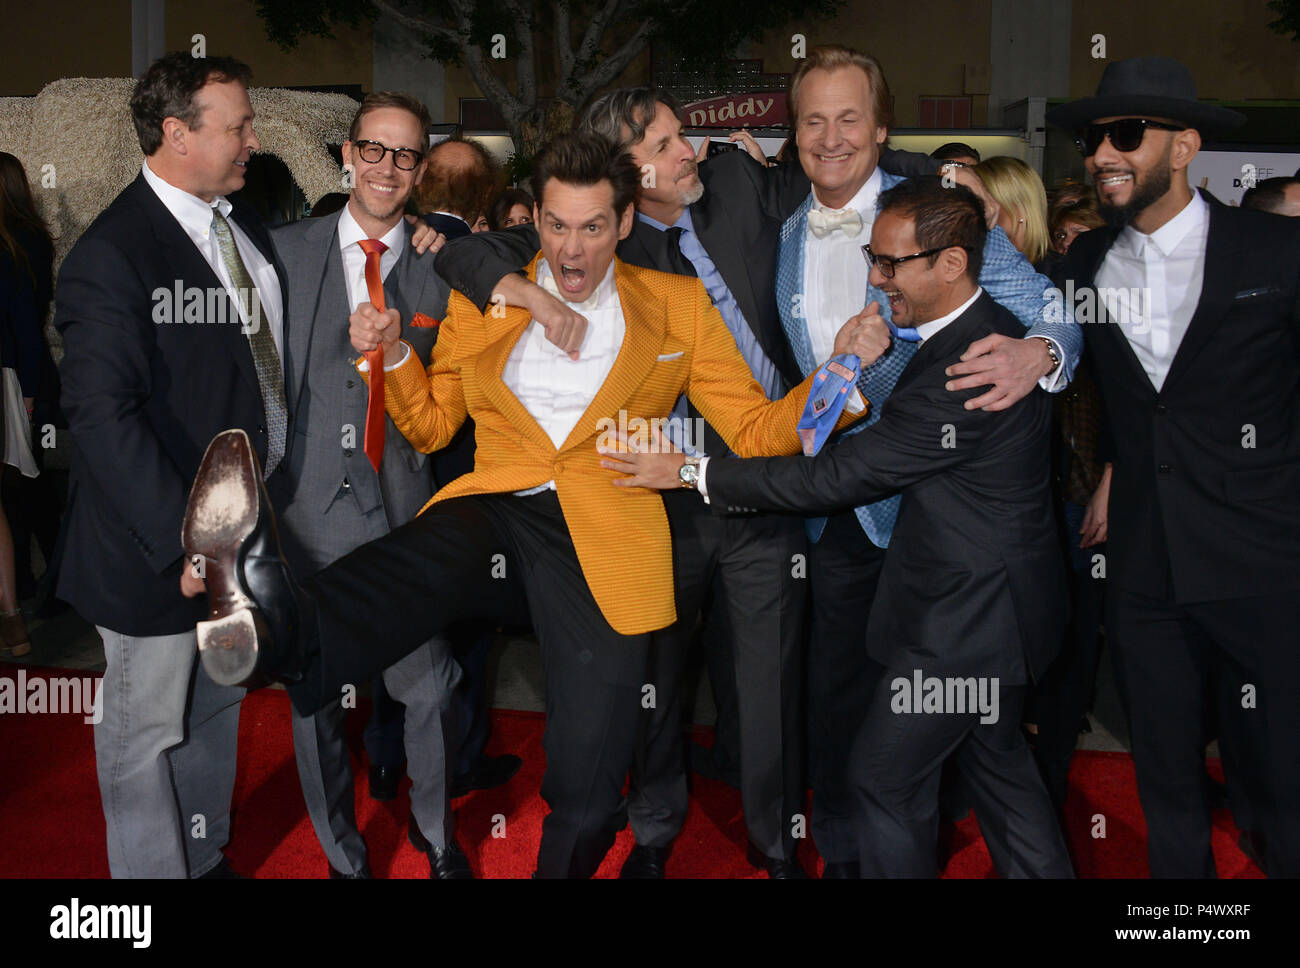 Jim Carrey, Jeff Daniels, Peter and Bobby Farrelly, Swizz